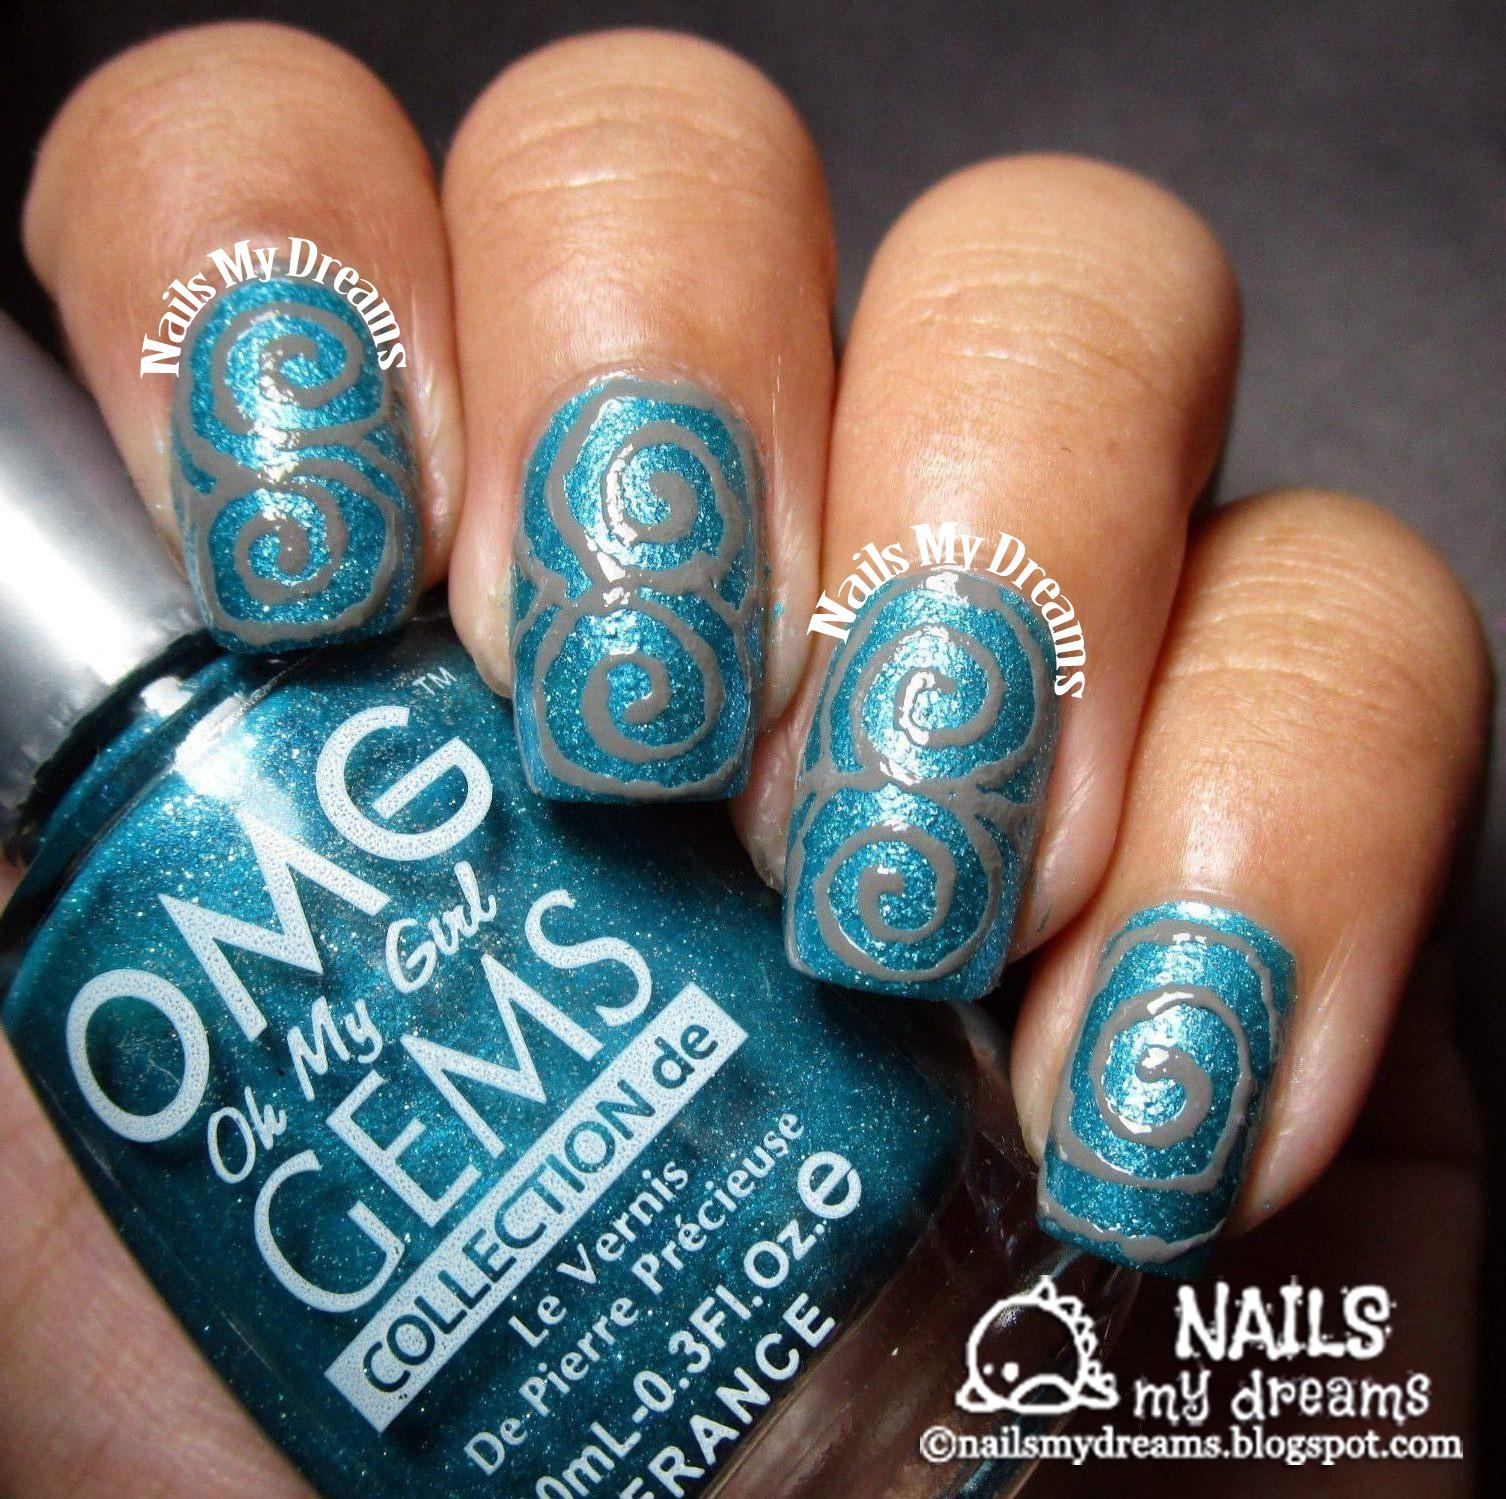 Nails My Dreams Swirls Nail Art